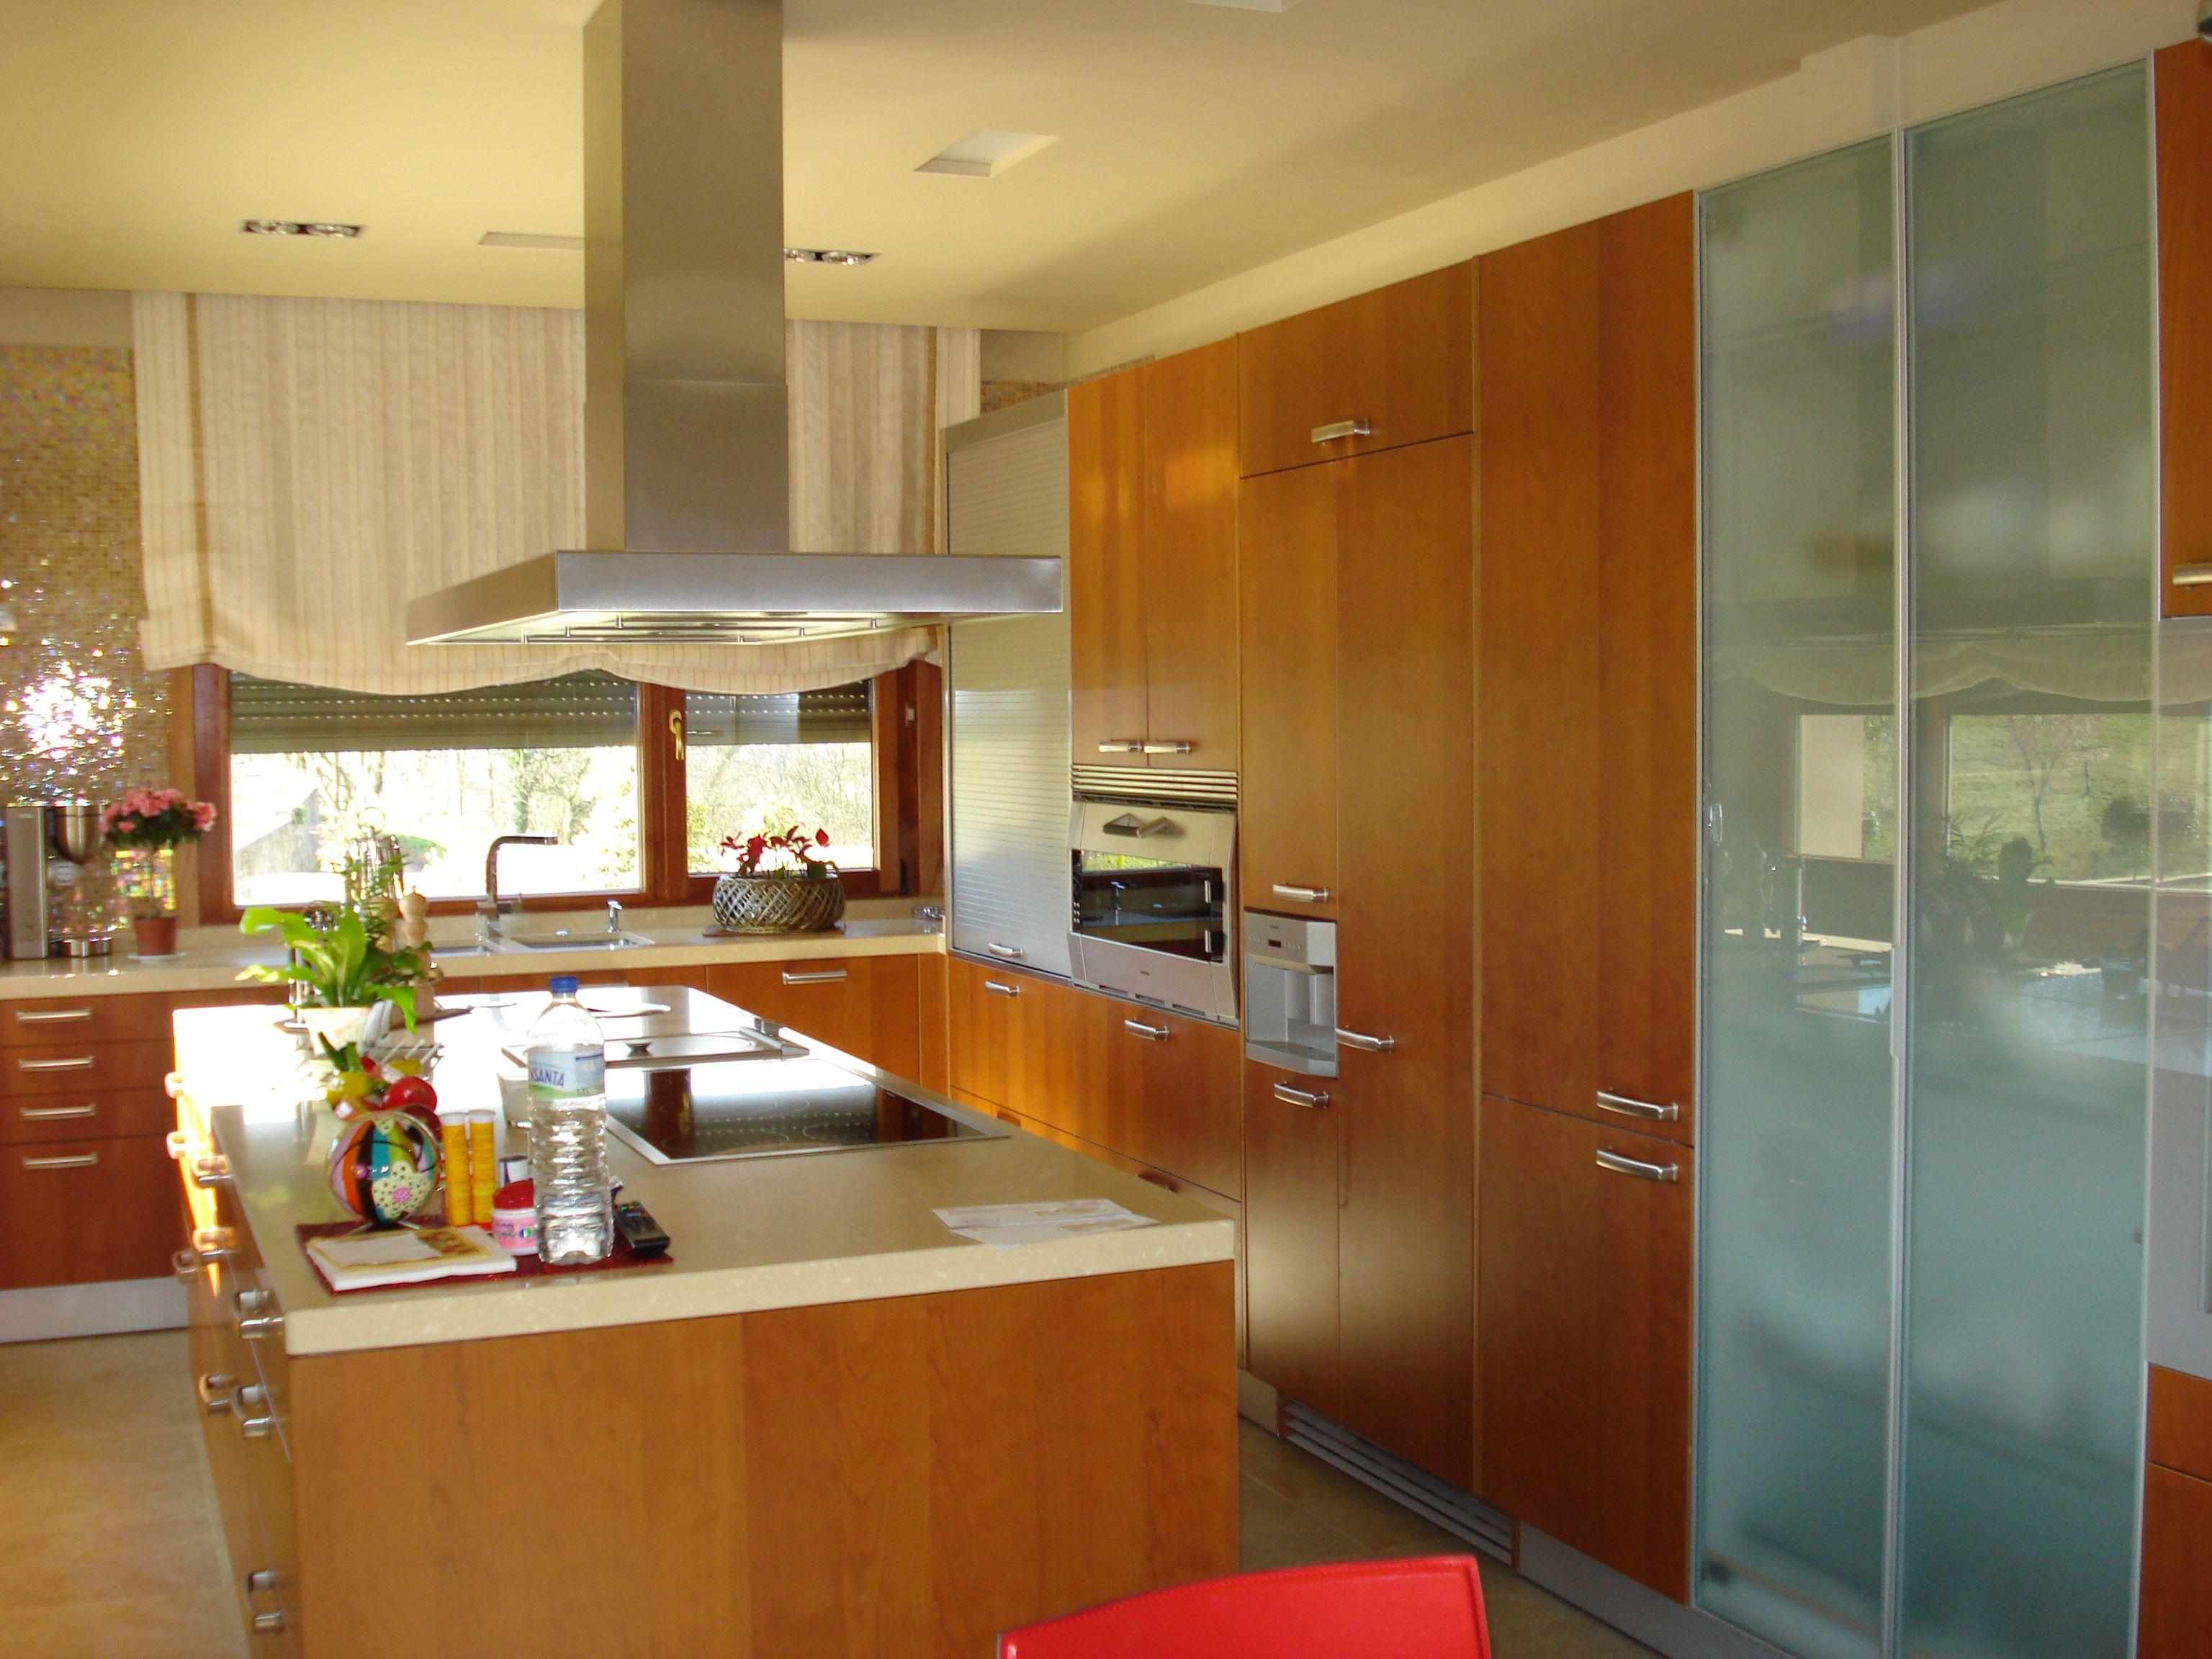 Cocina Santos Modelo Marina Acabado Cerezo Todo Un Lujo Con  # Muebles Cocinas Soinco